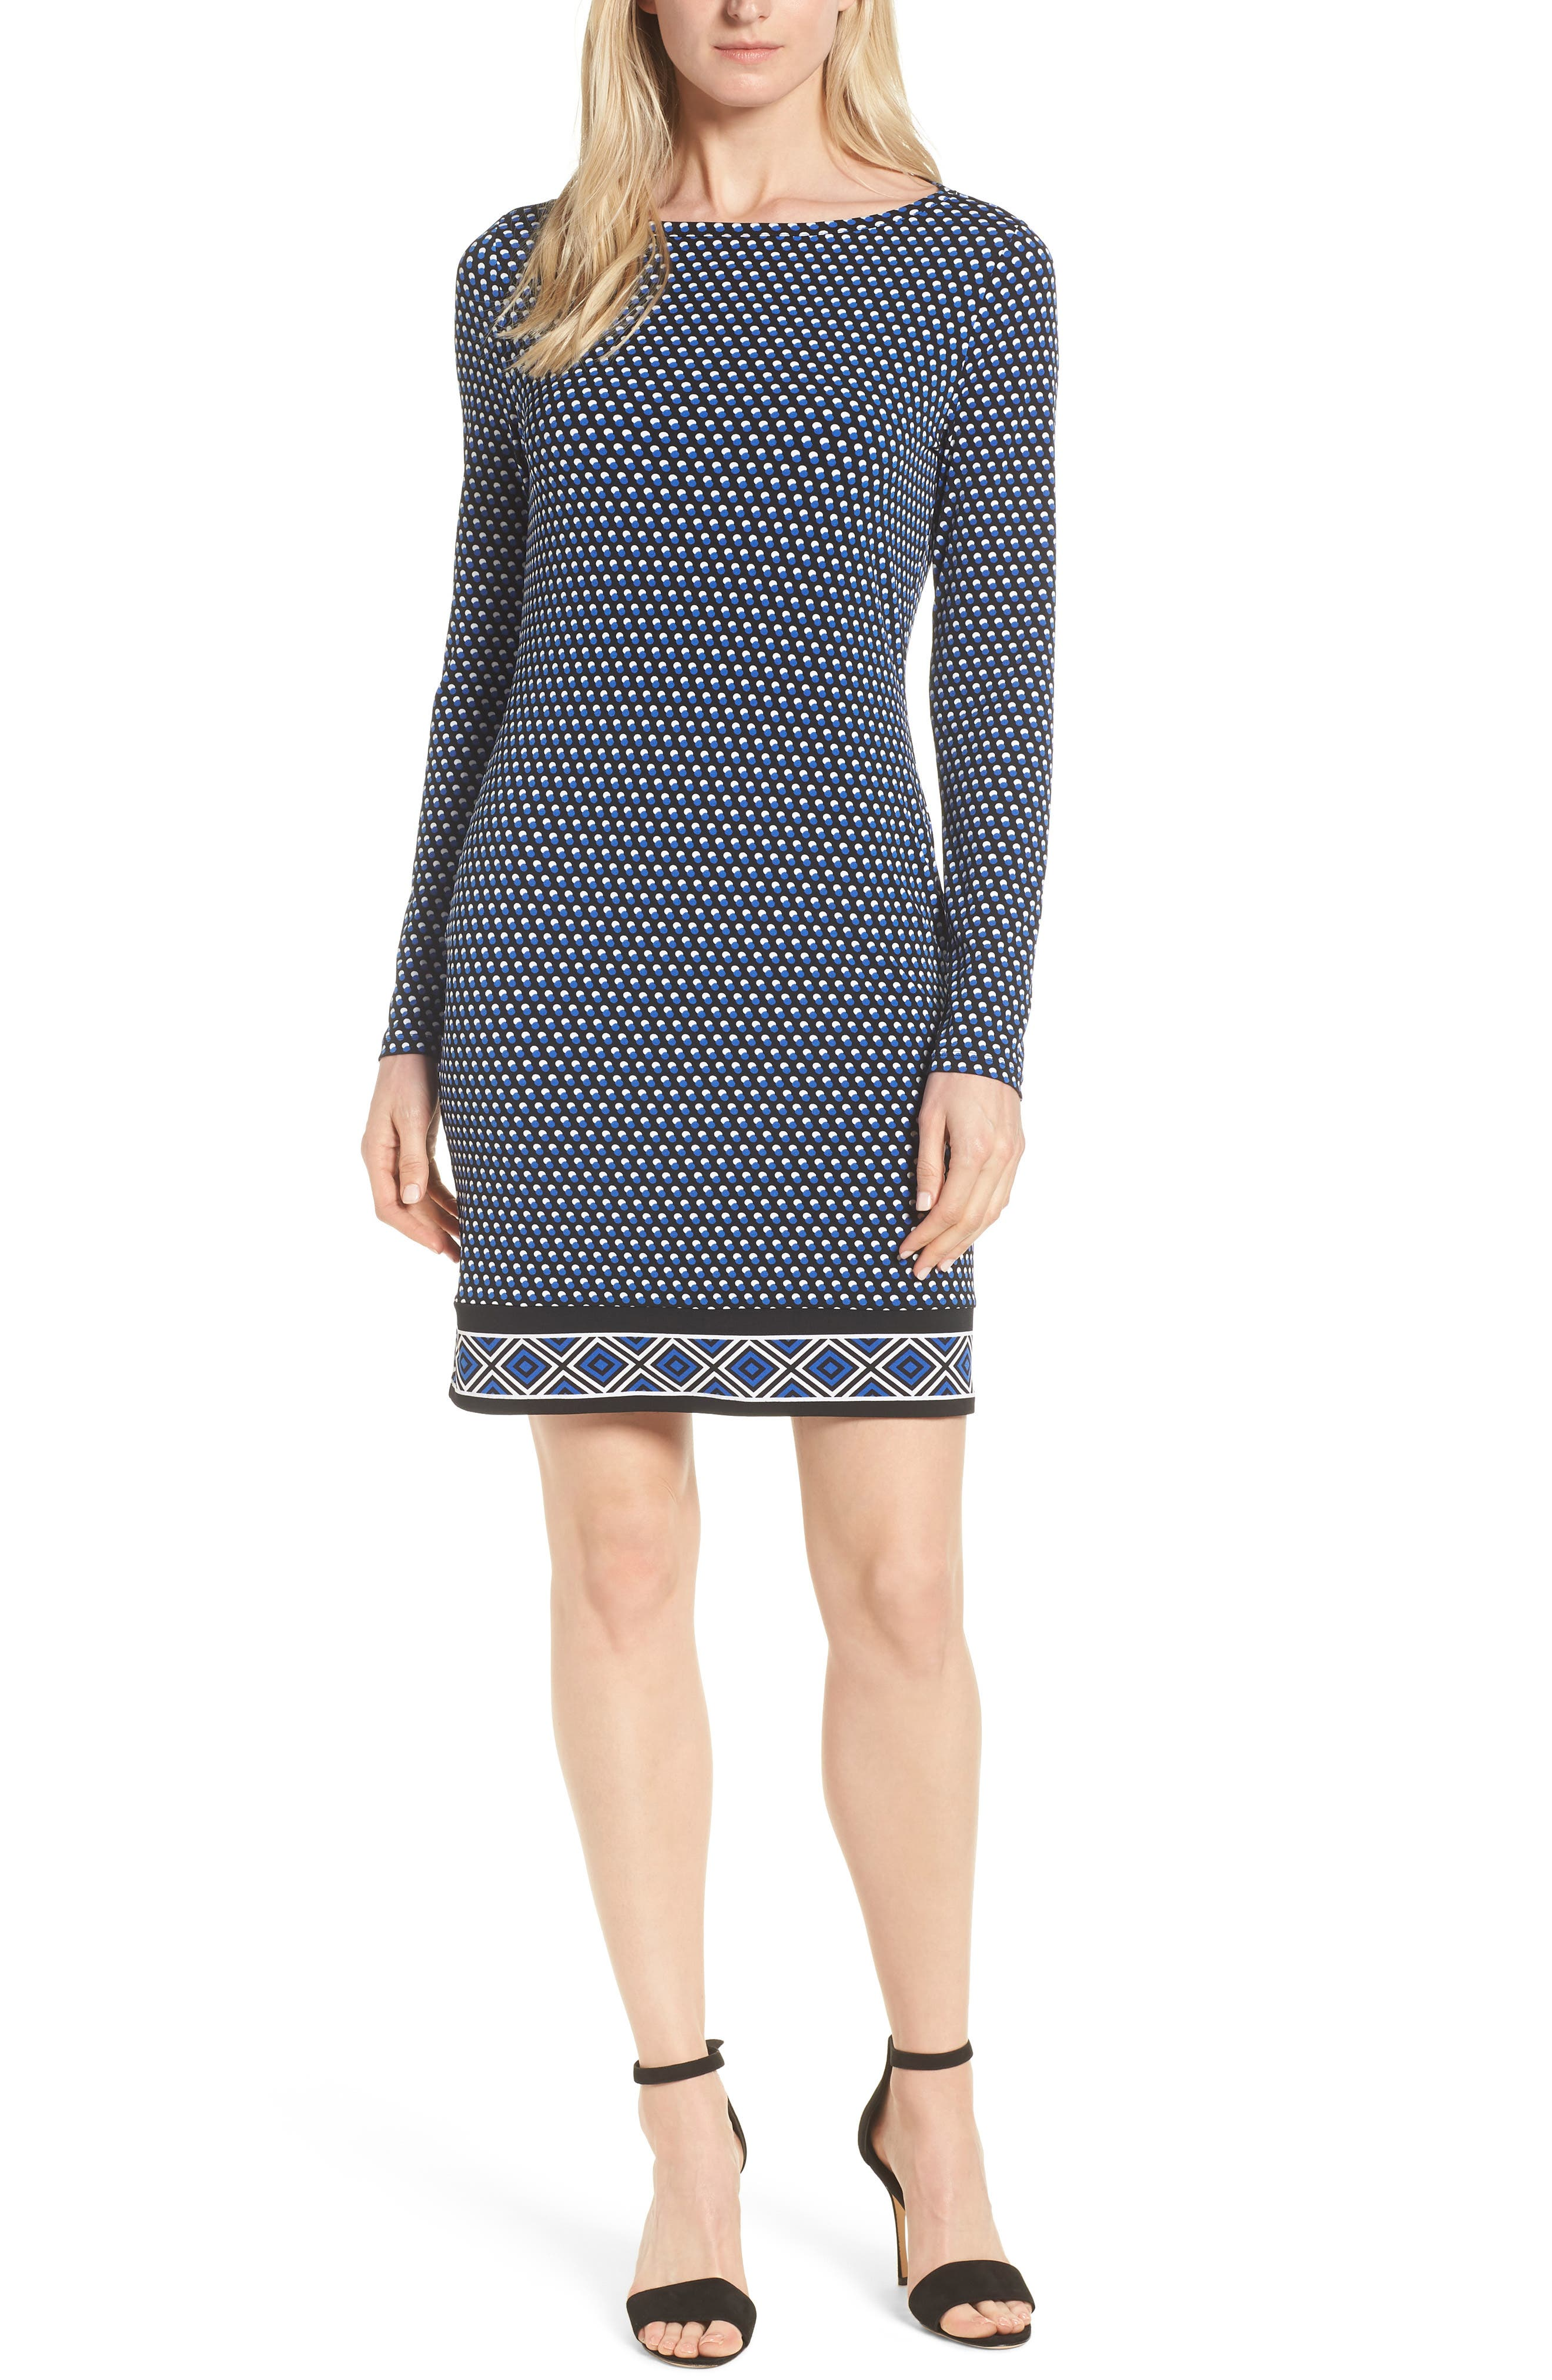 Michael Michael Kors Alston Boatneck Contrast Border Print Dress, Blue